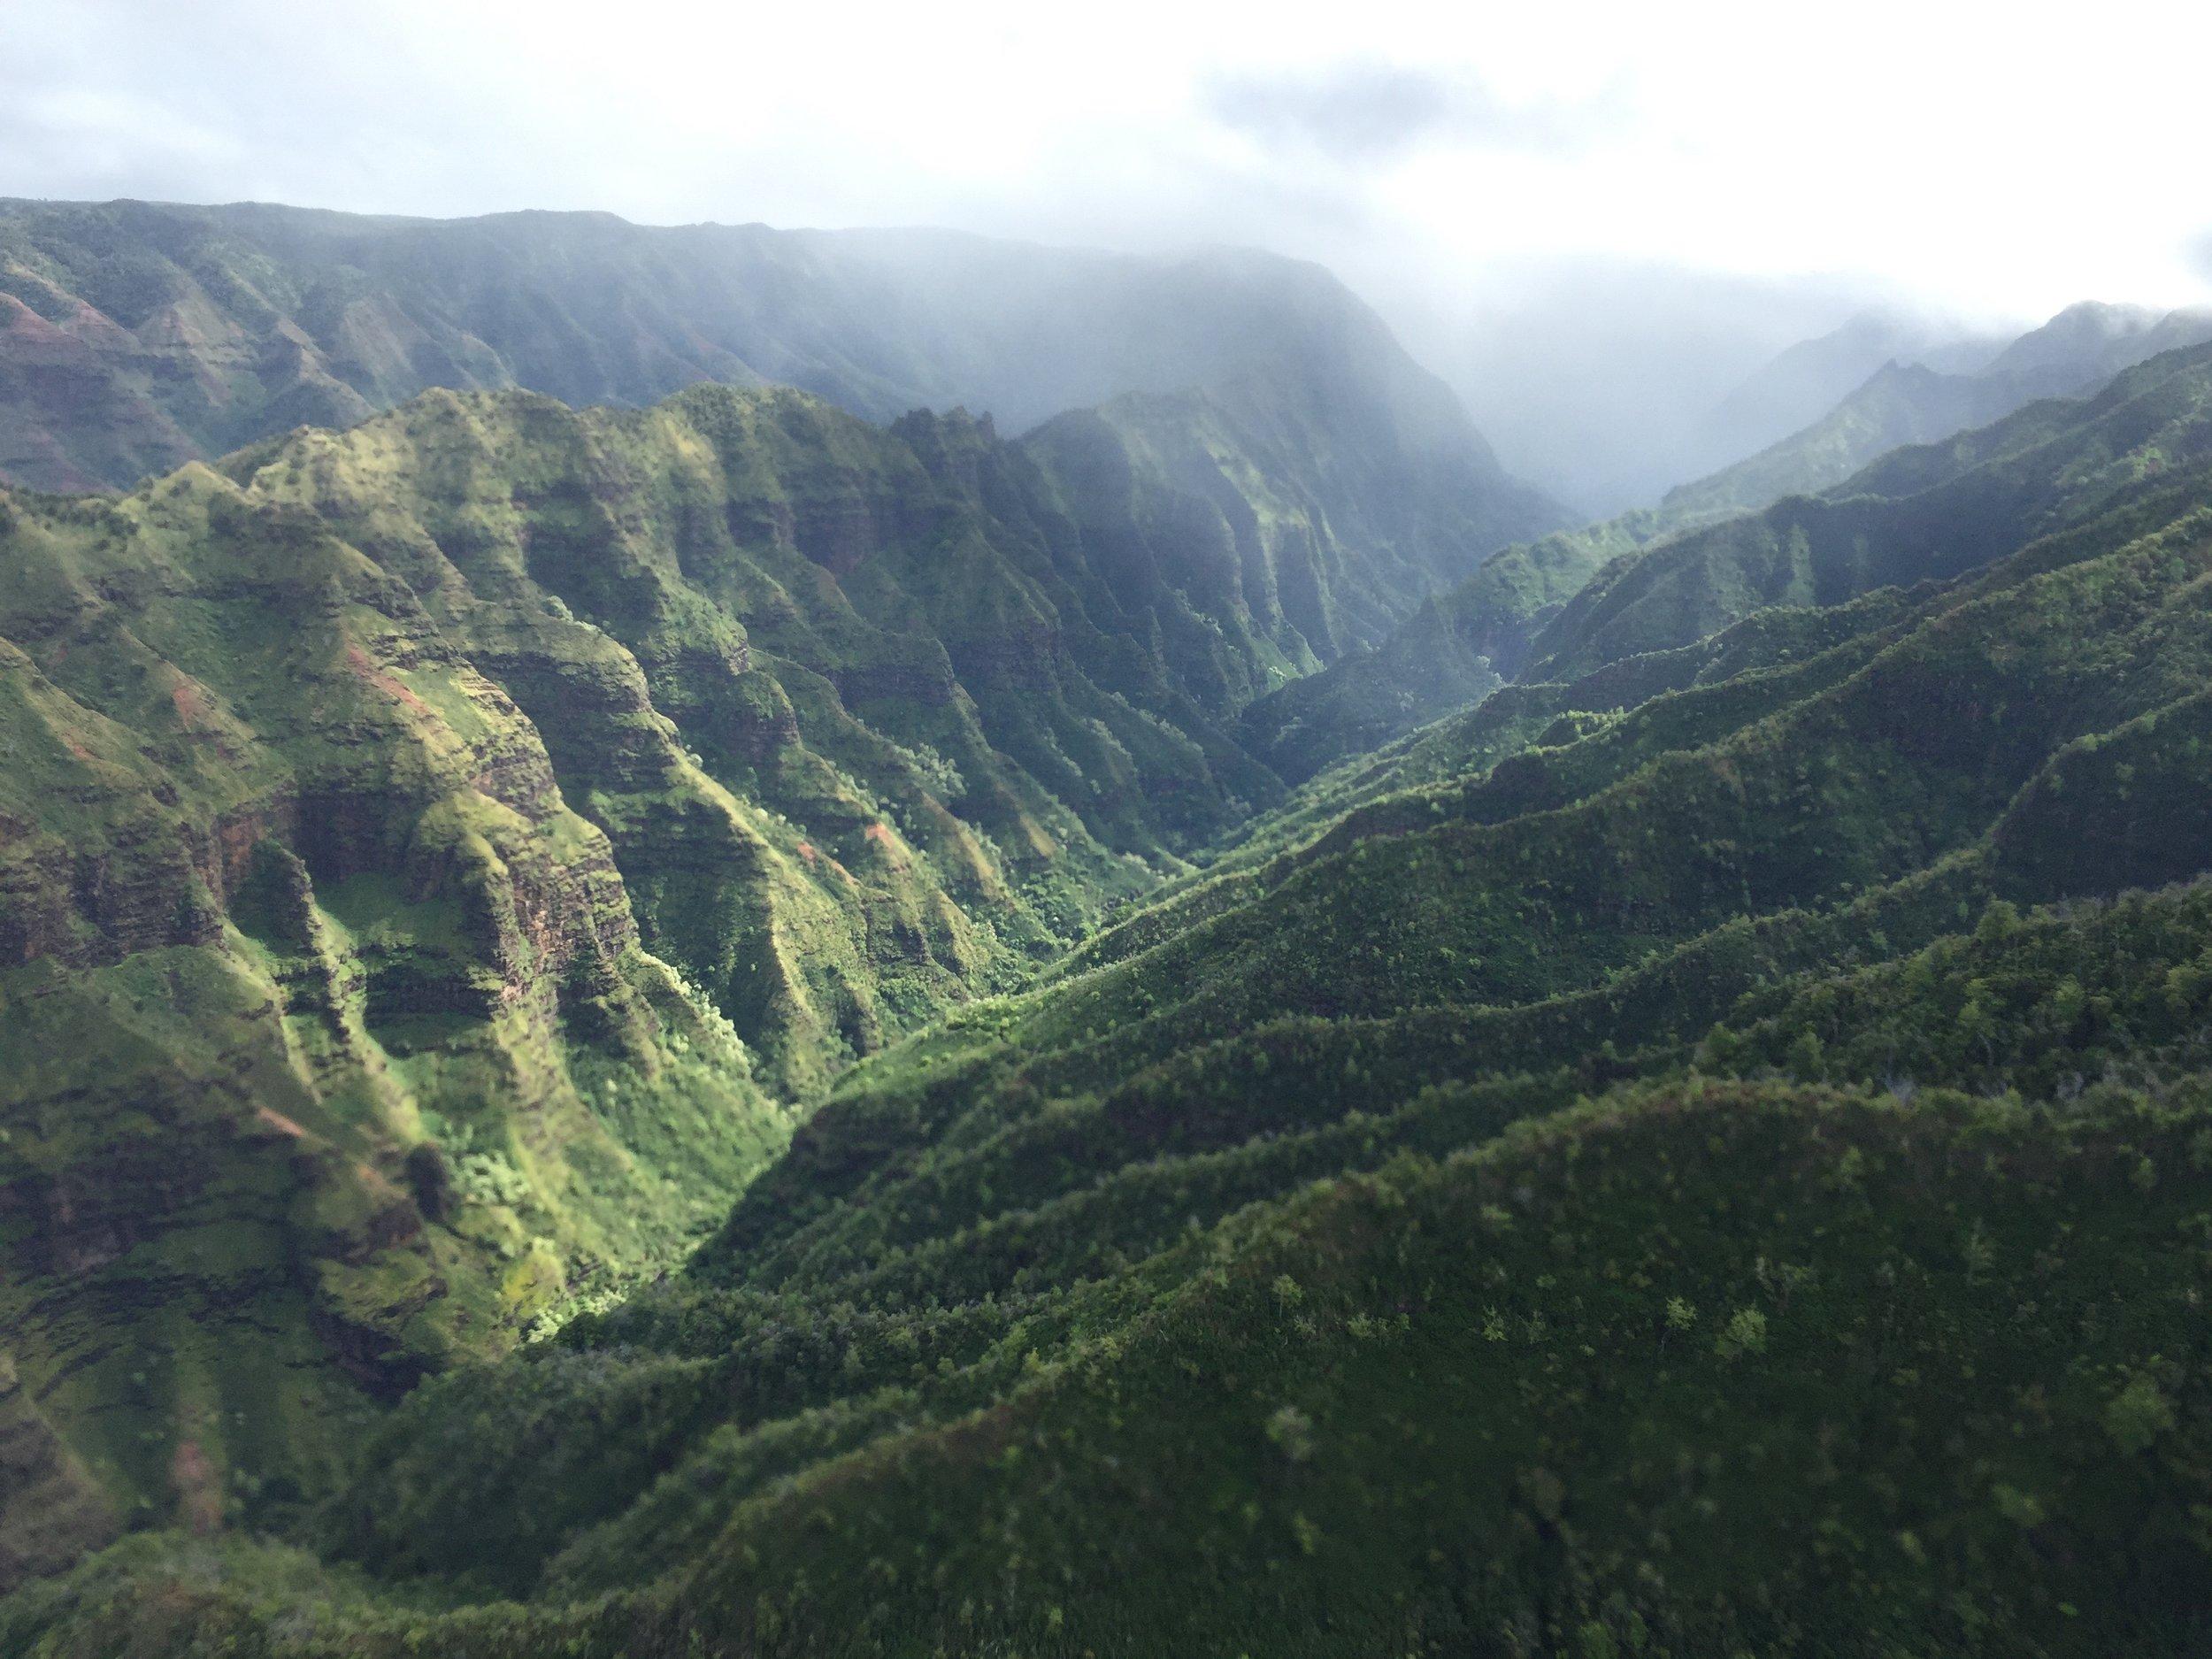 Kauai from above.